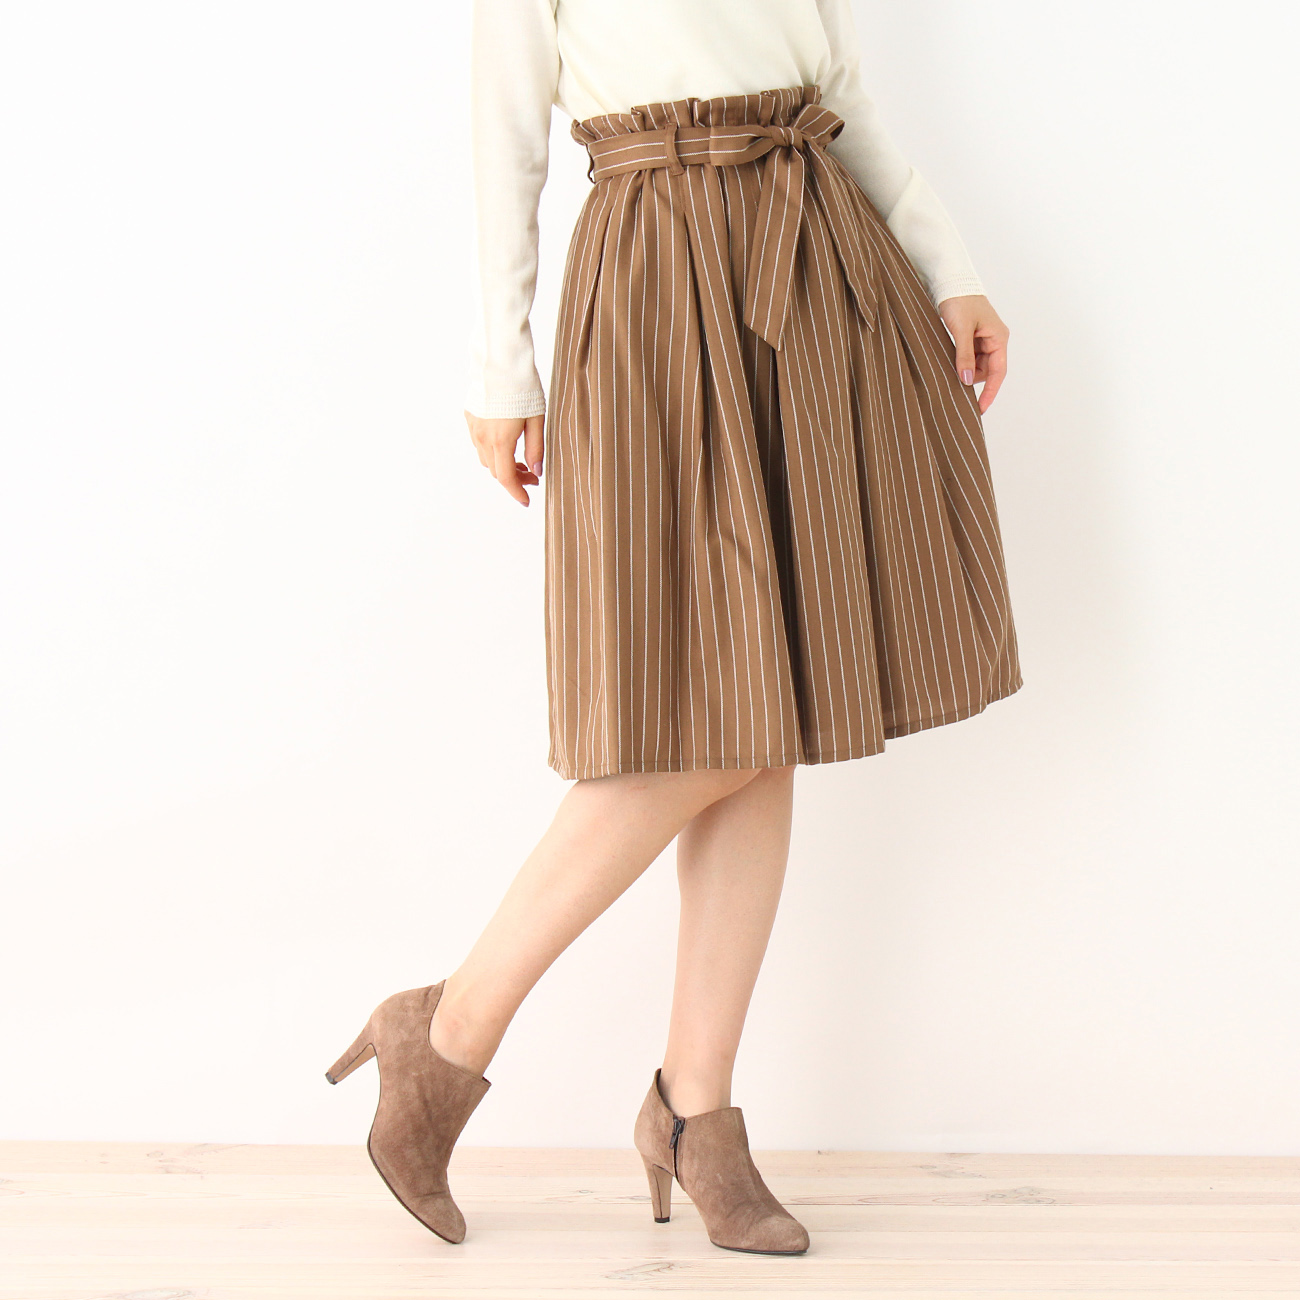 【SOUP (スープ)】INCEDE 先染めストライプギャザースカートレディース スカート|ひざ丈 キャメル